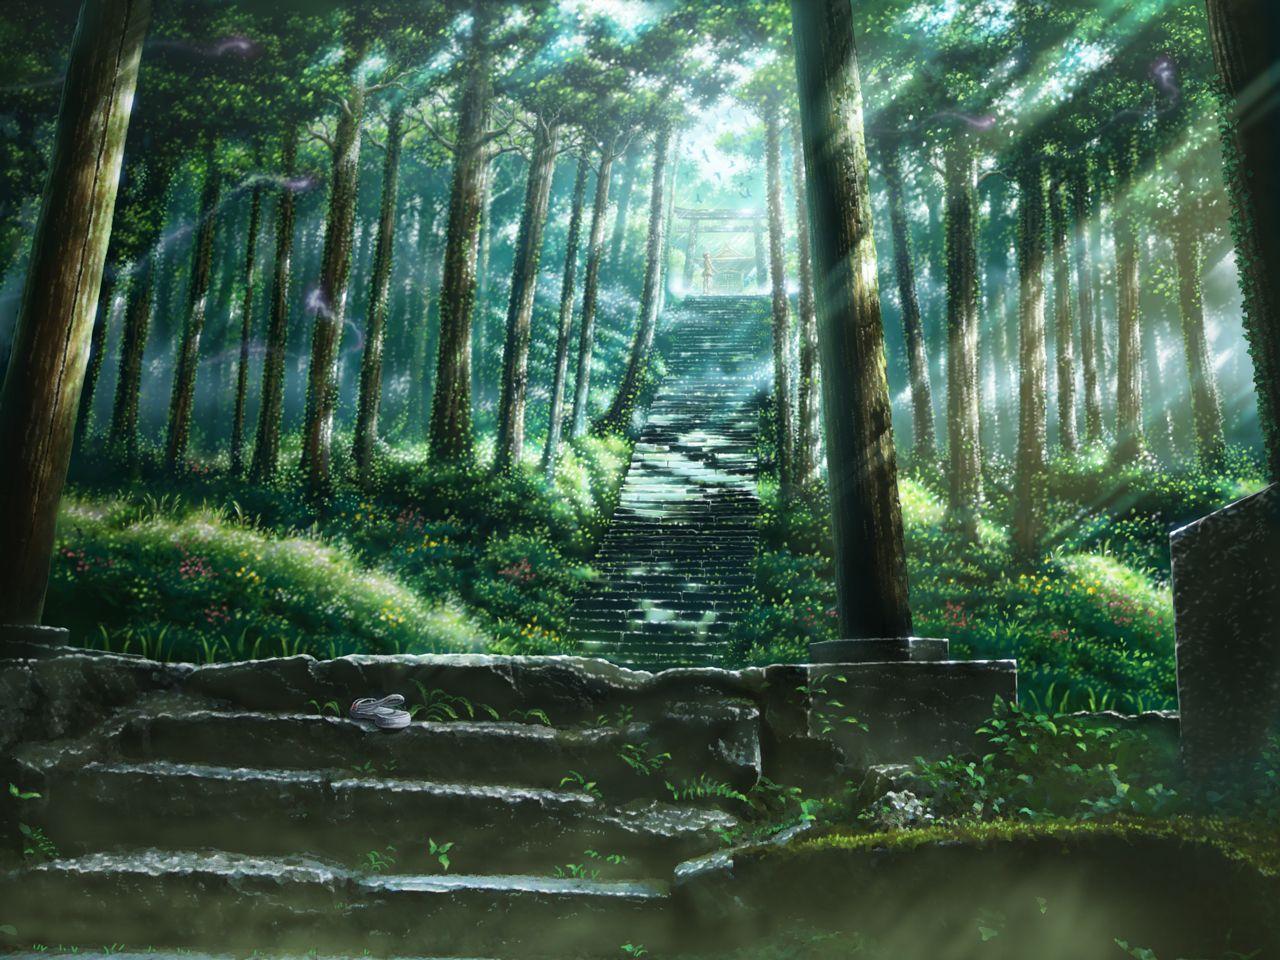 Outdoor Anime Landscape Anime Background Anime Scenery Studio Ghibli Background